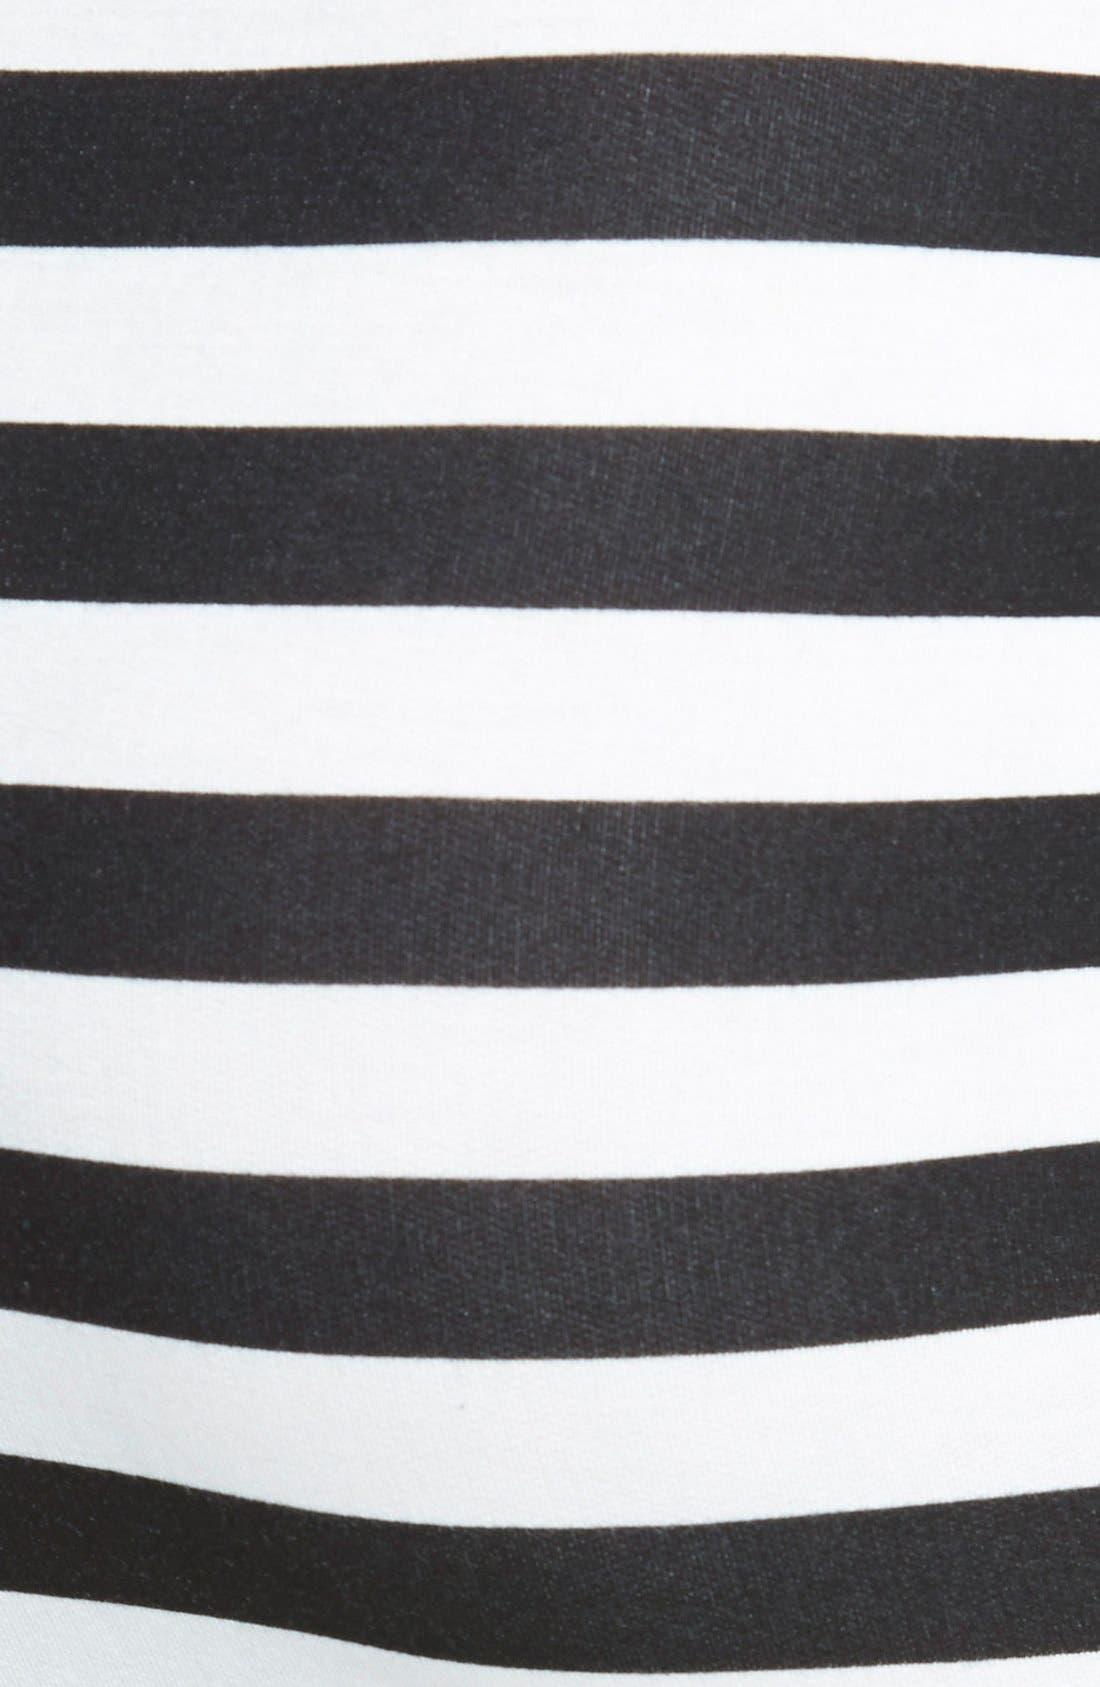 Alternate Image 3  - Lush Stripe Bandage Skirt